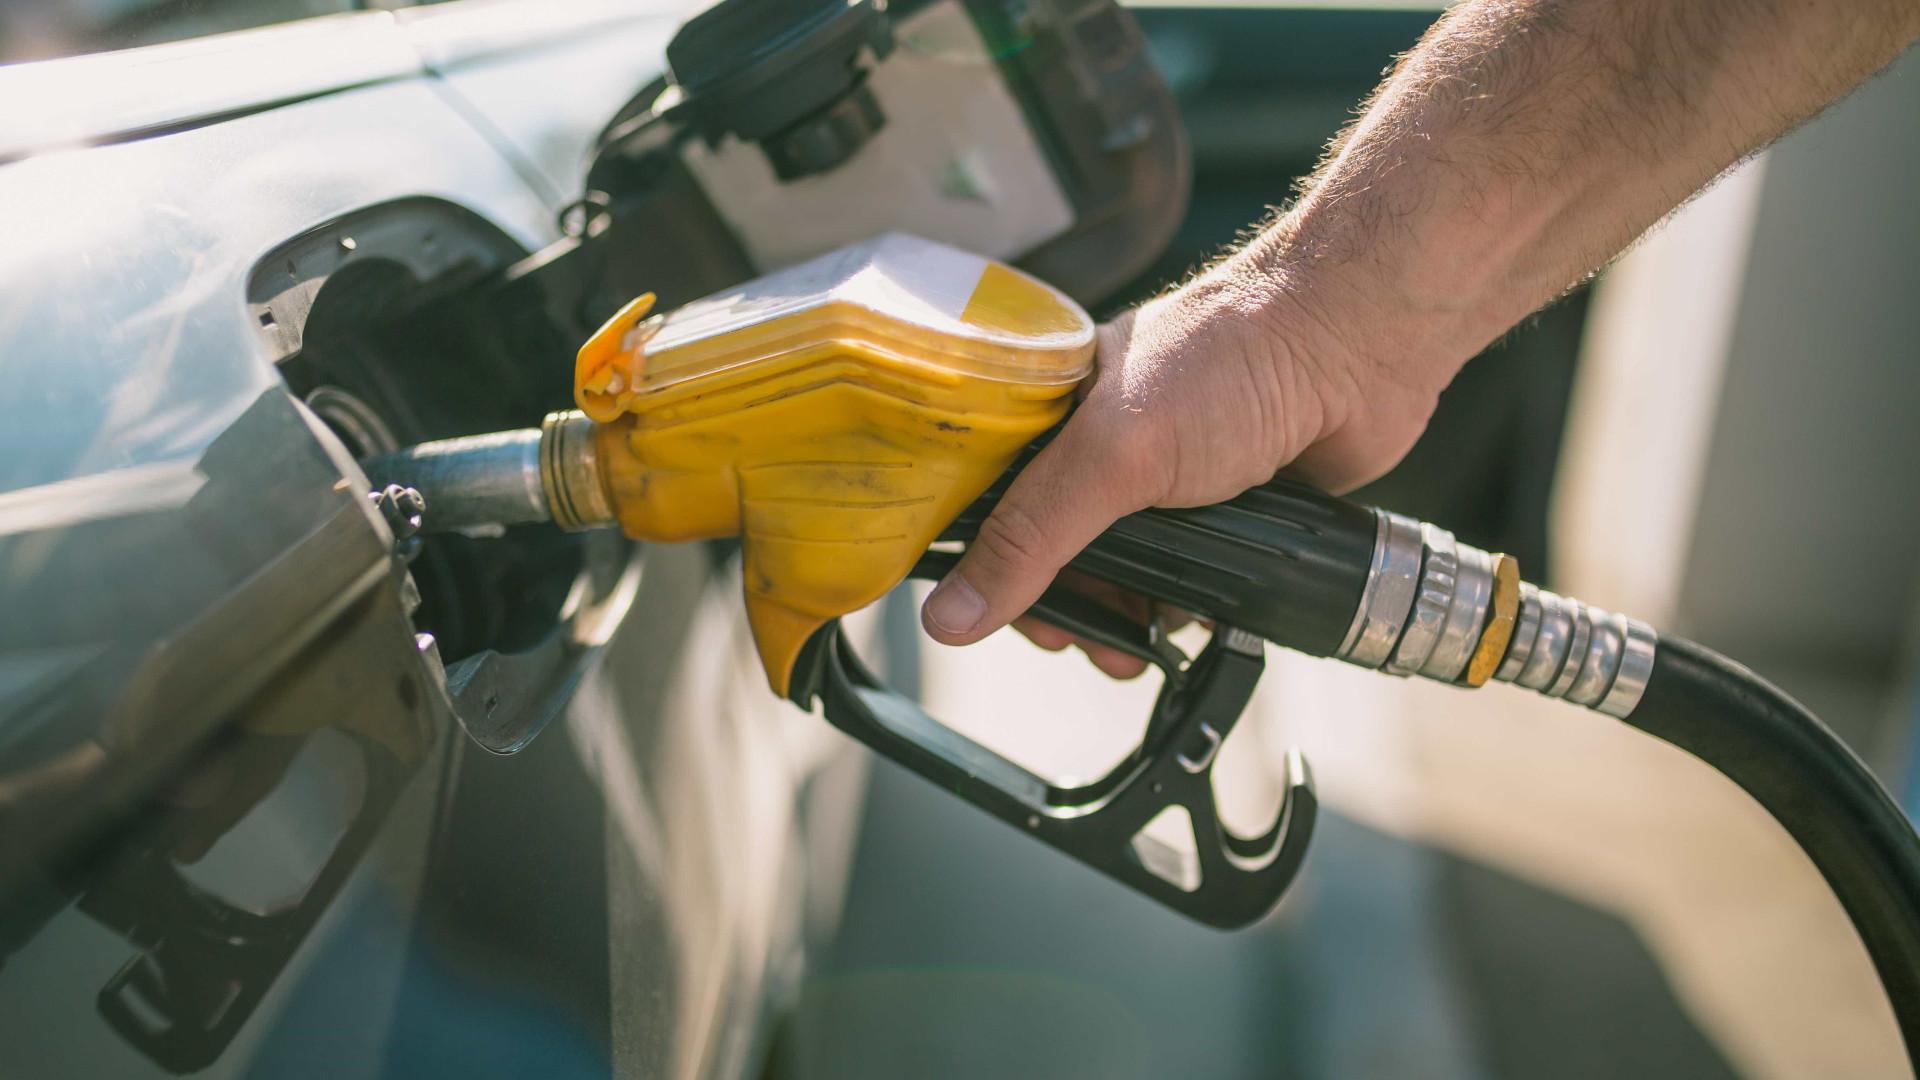 Estados descartam plano de Bolsonaro de cortar ICMS sobre combustíveis